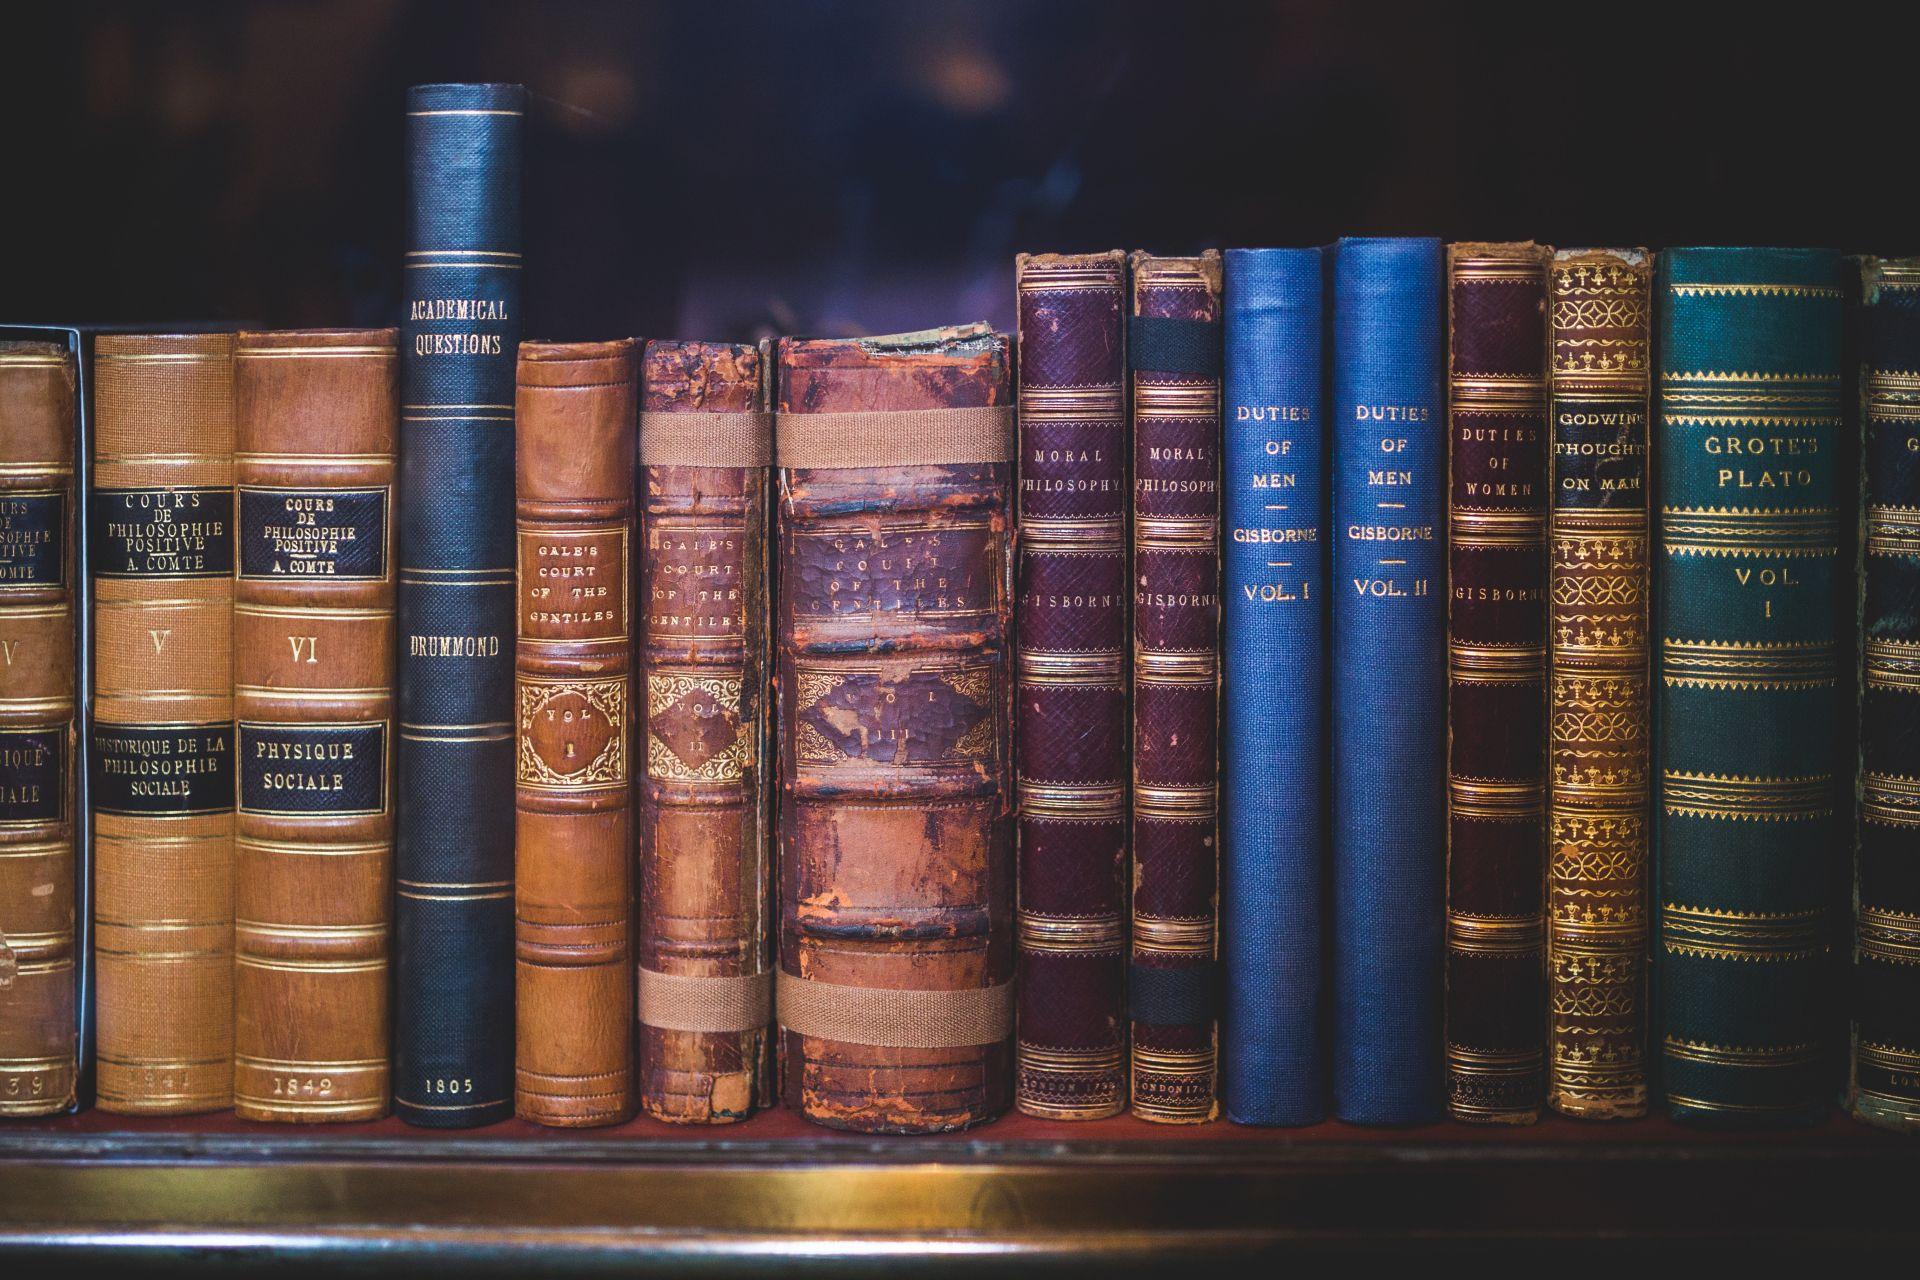 stare książki ustawione na półce